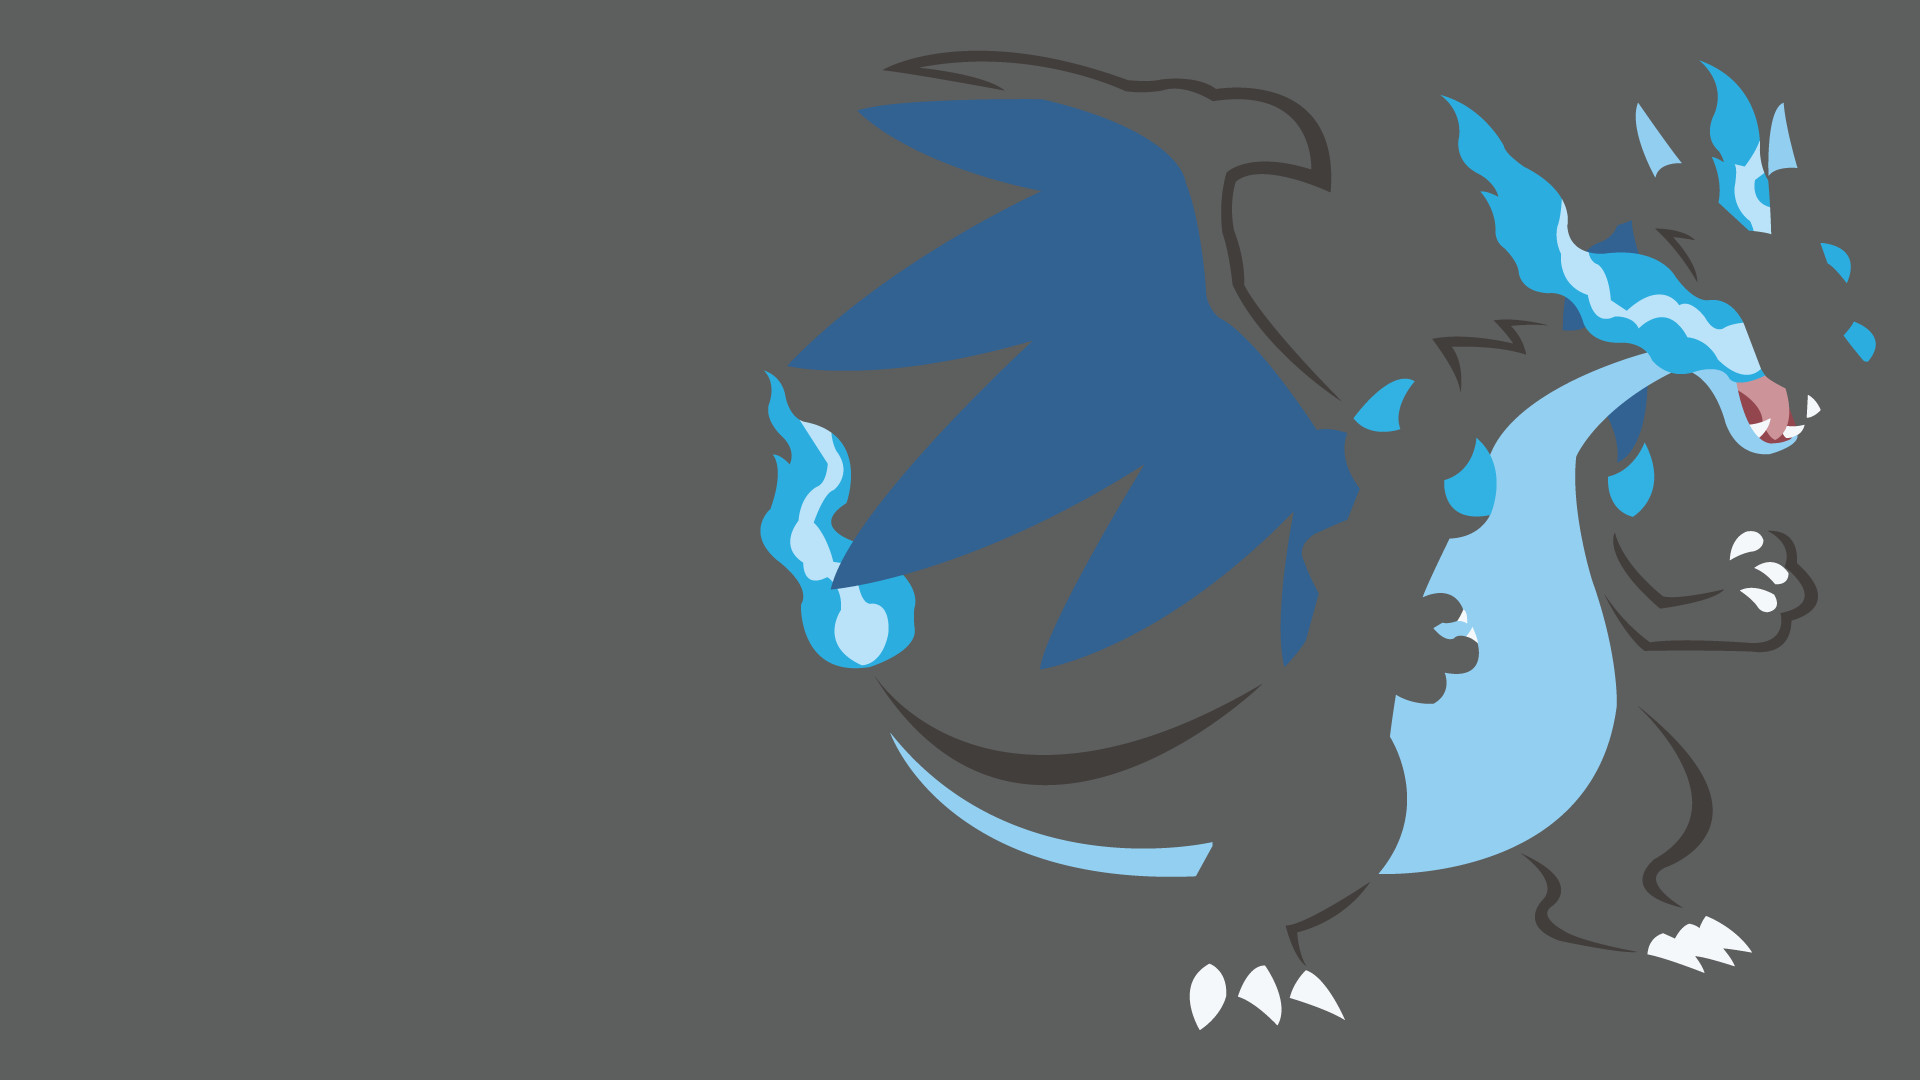 Pokemon Wallpaper Hd For Desktop 2 Mega Charizard X